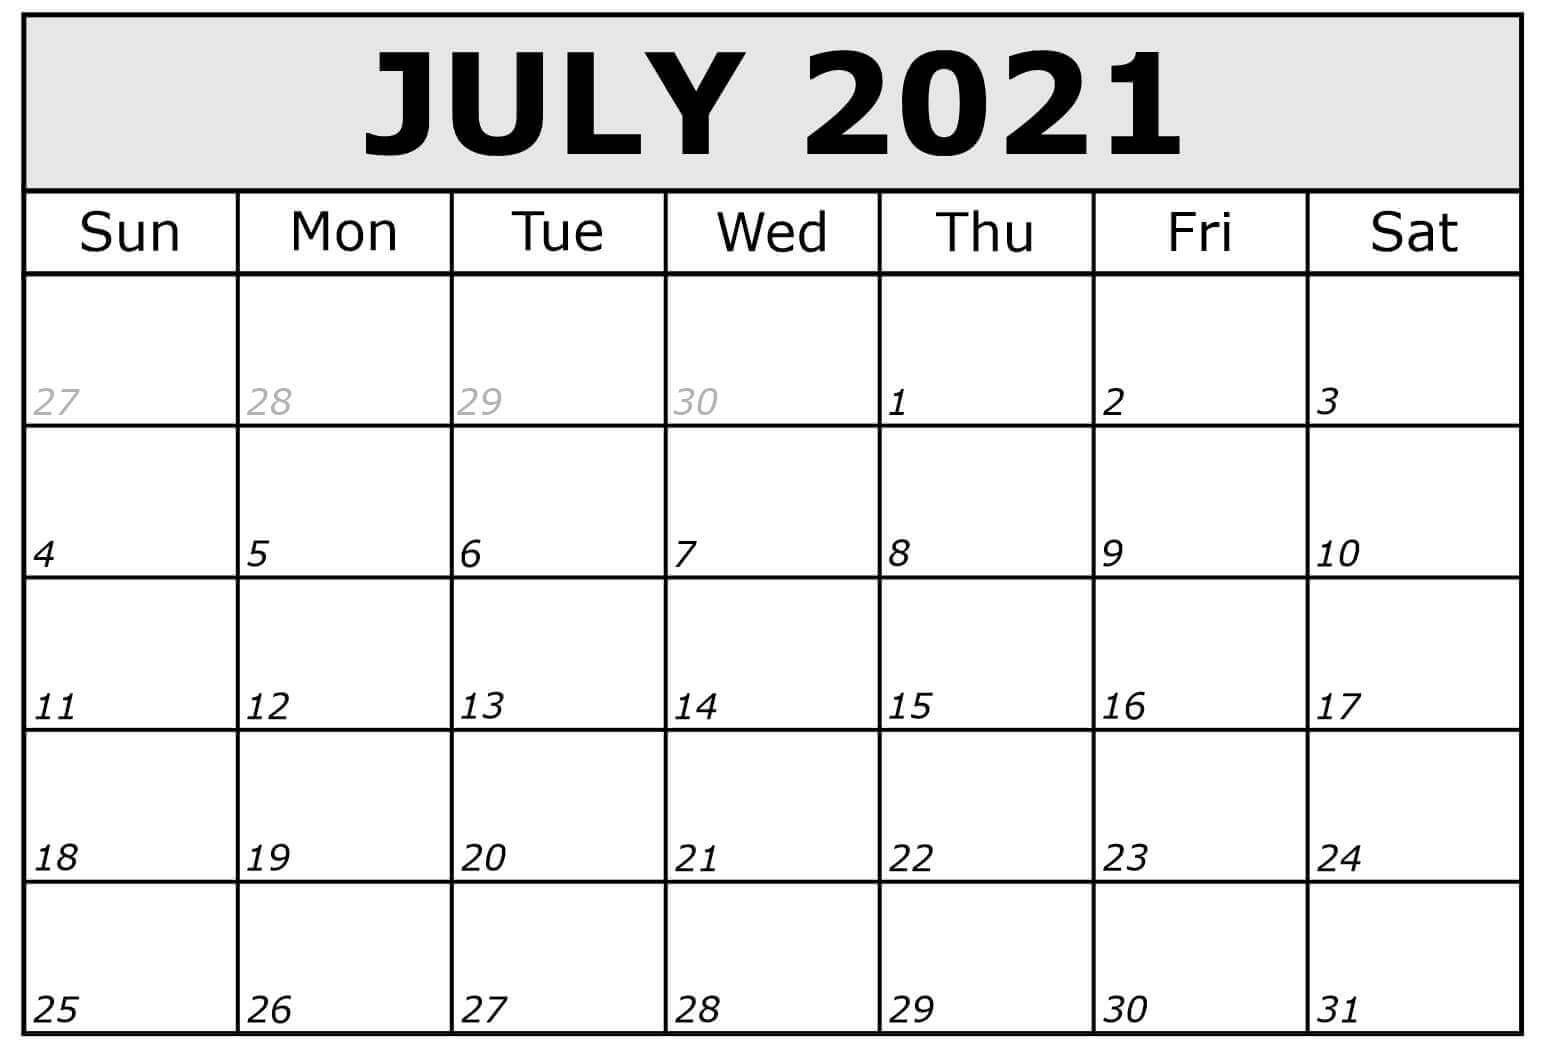 2021 July Printable Calendar